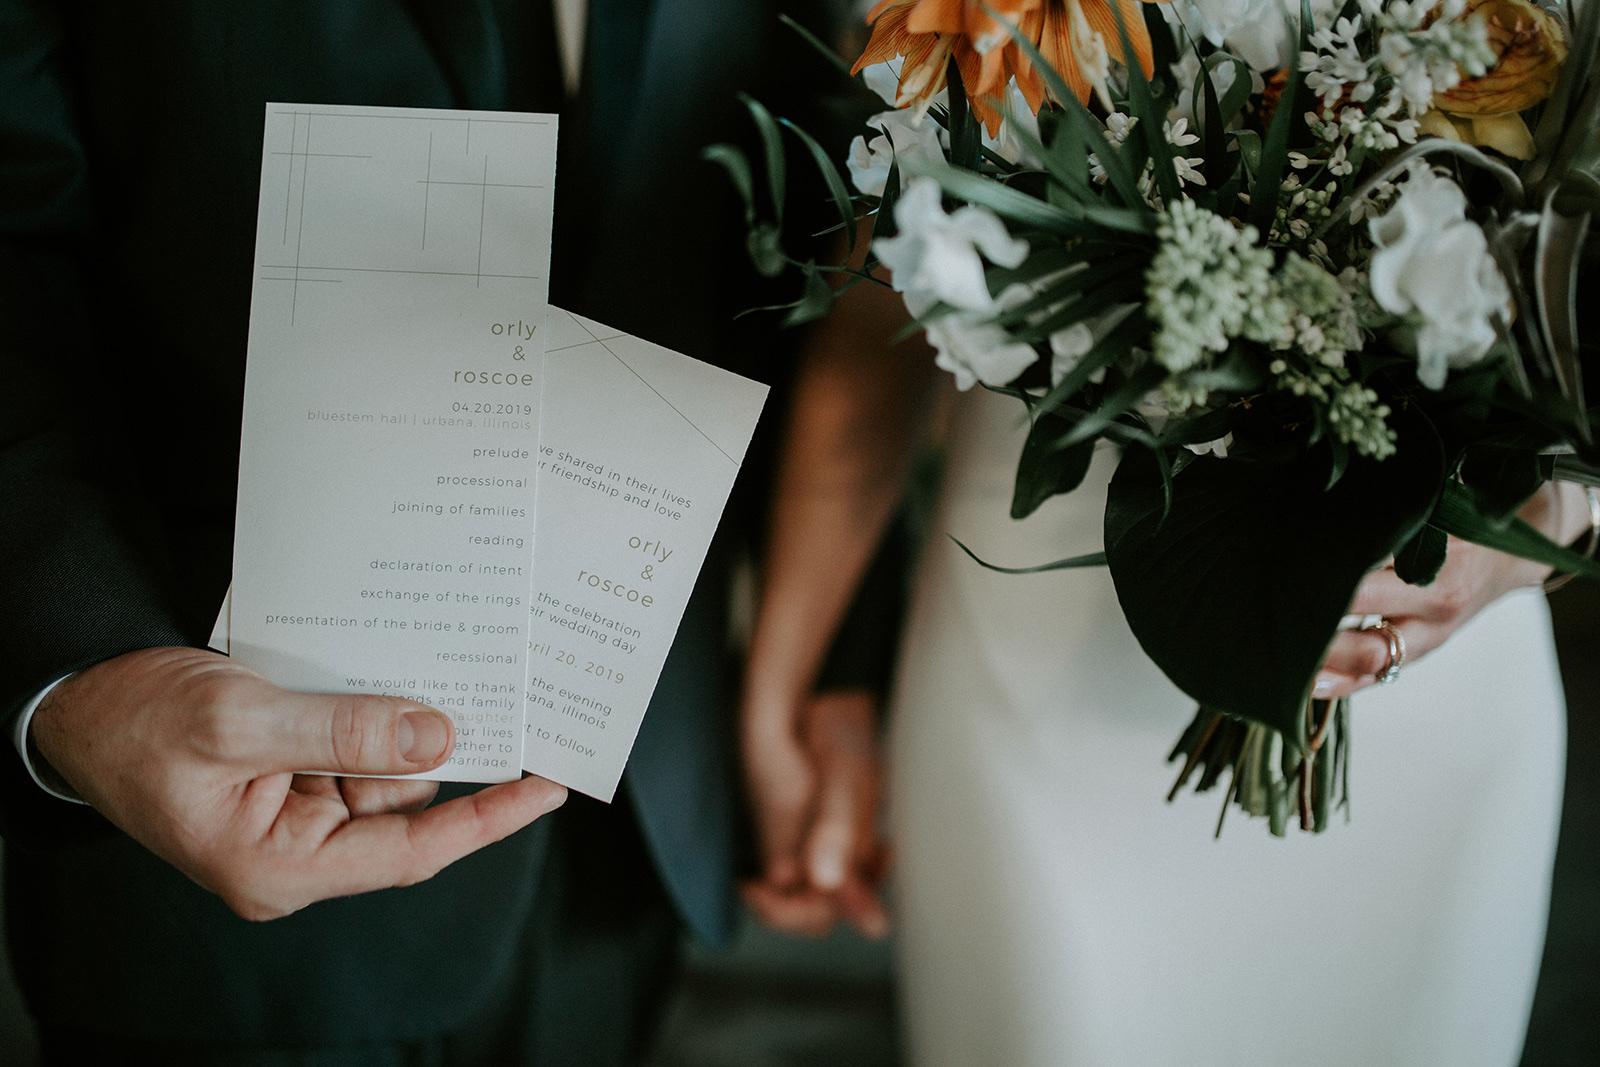 bluestem_hall_champaign_wedding_photographer_wright_photographs_collaboration_0242.jpg